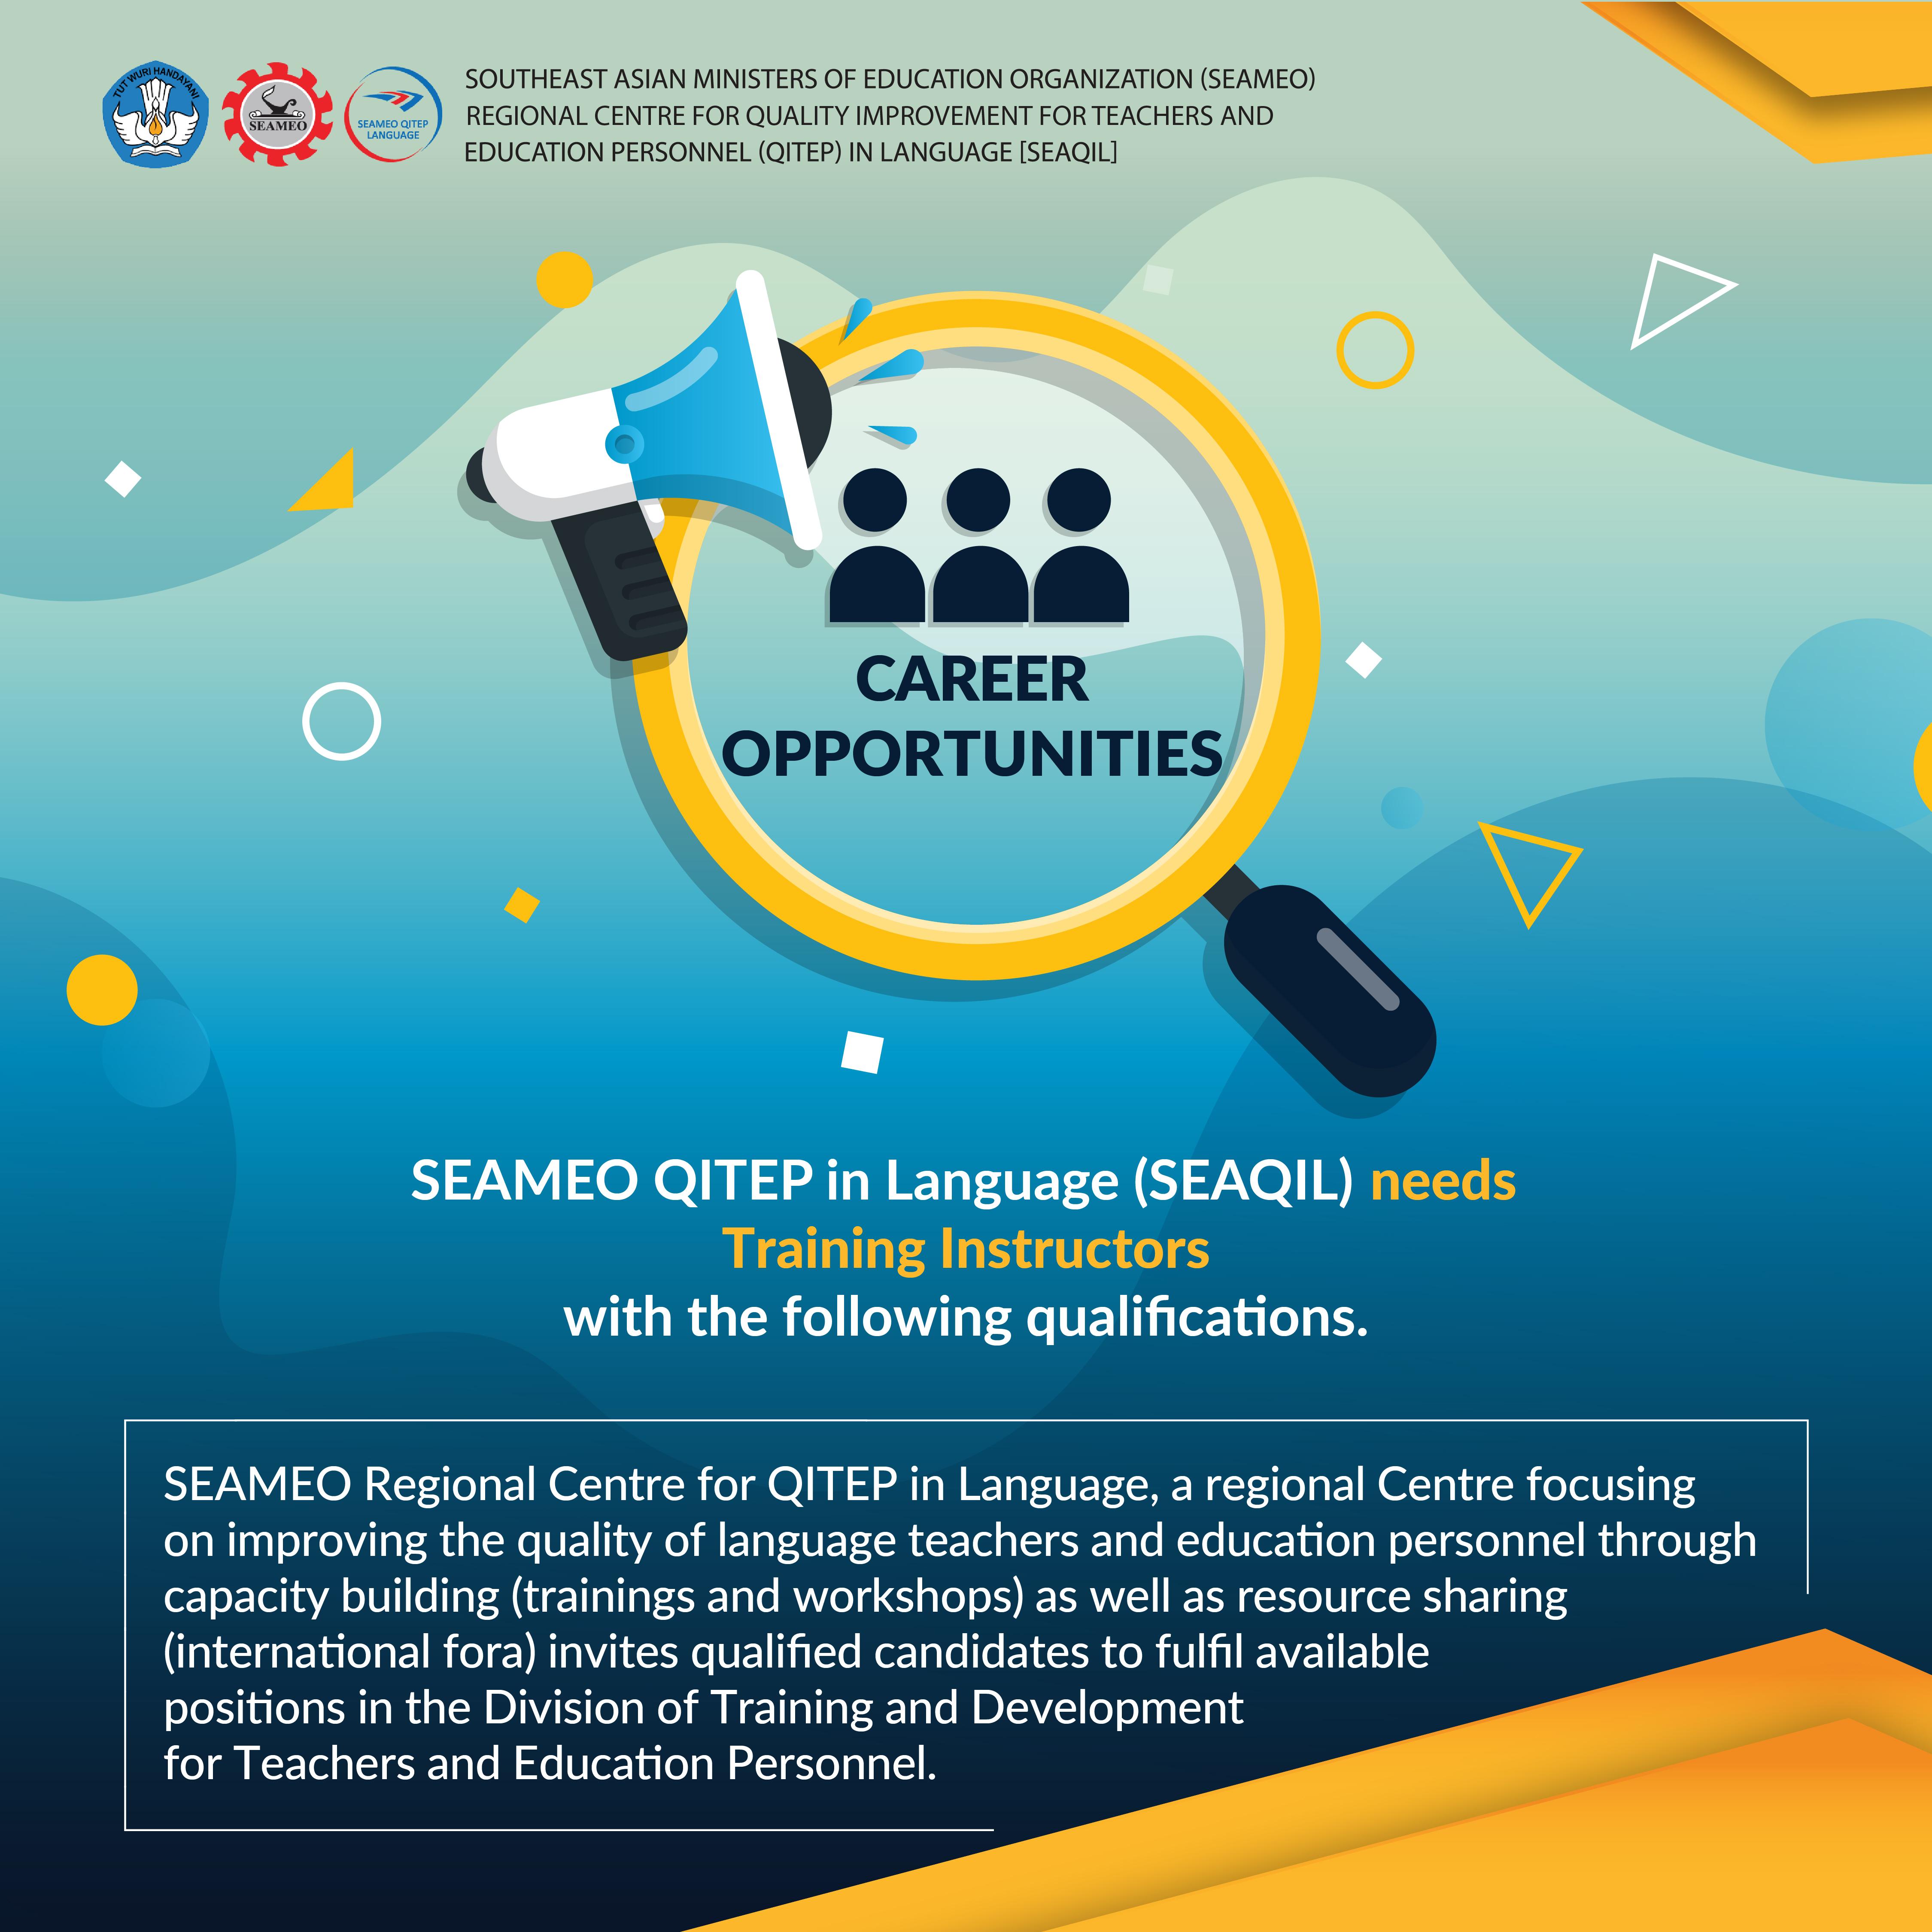 career opportunities_training_1